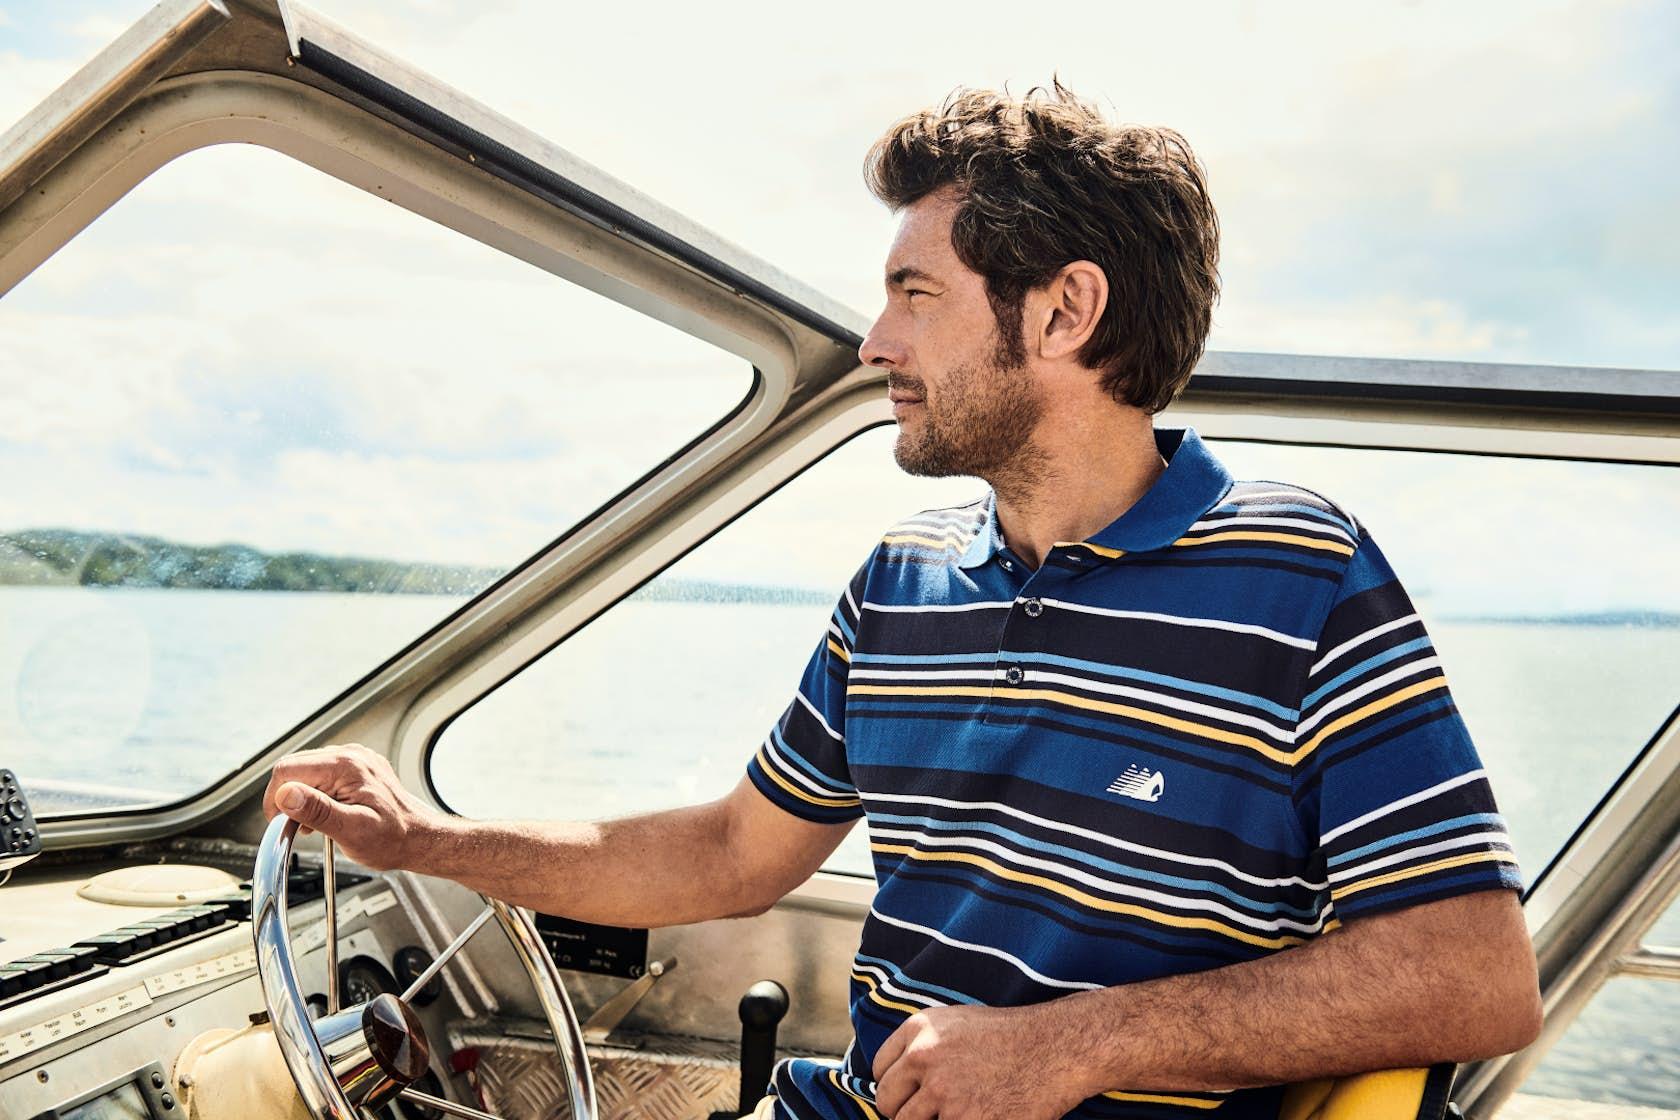 RAGMAN Man of Joy Herren Outfit, Poloshirt, Boot fahren